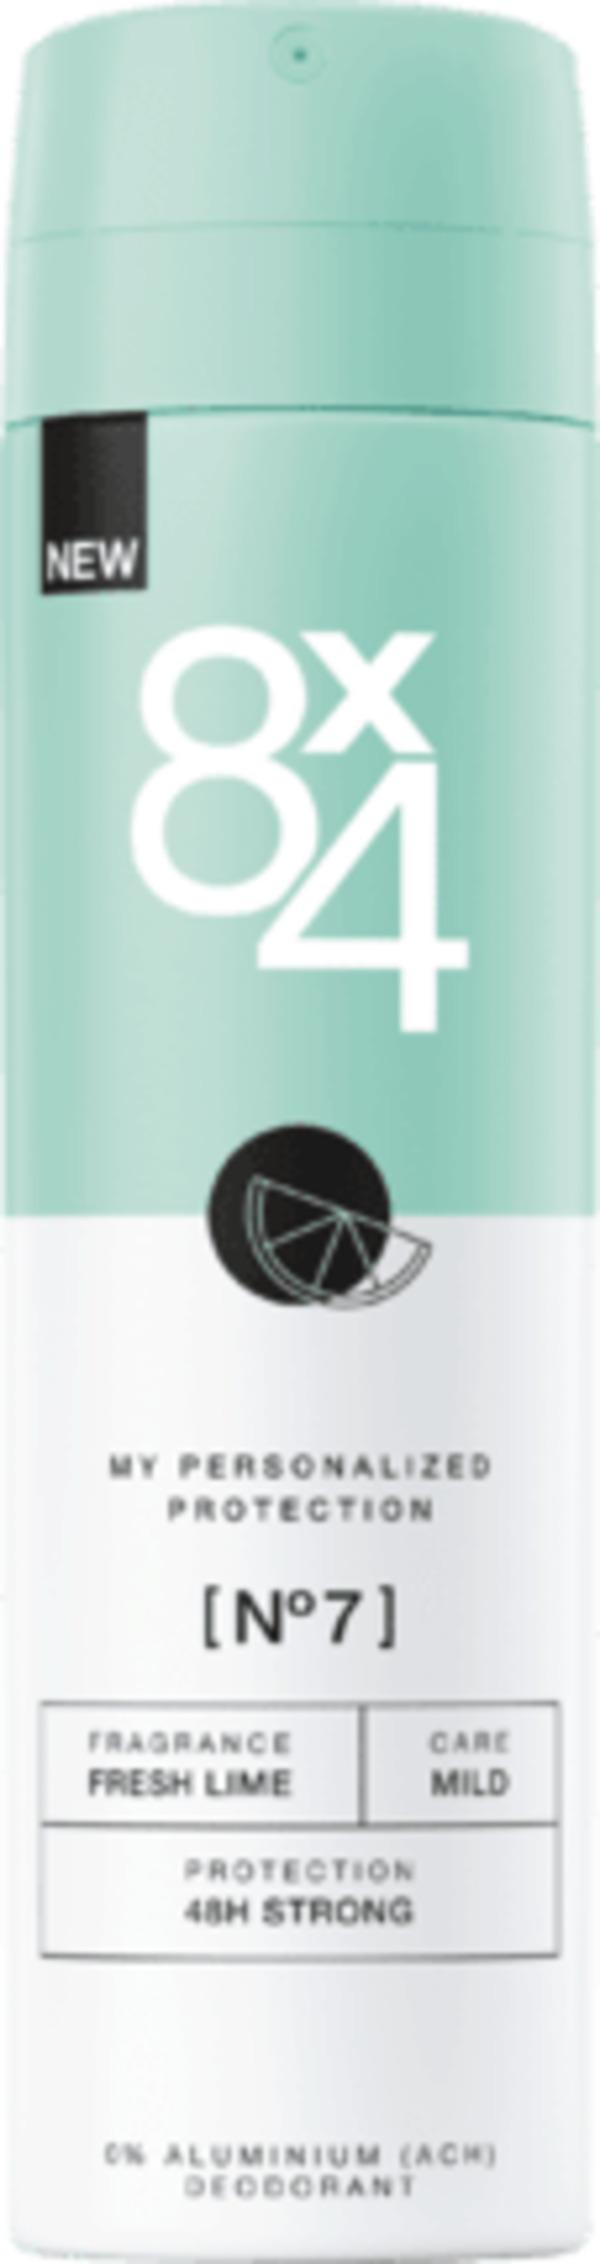 8x4 women Deo Spray Deodorant No.7 Fresh Lime